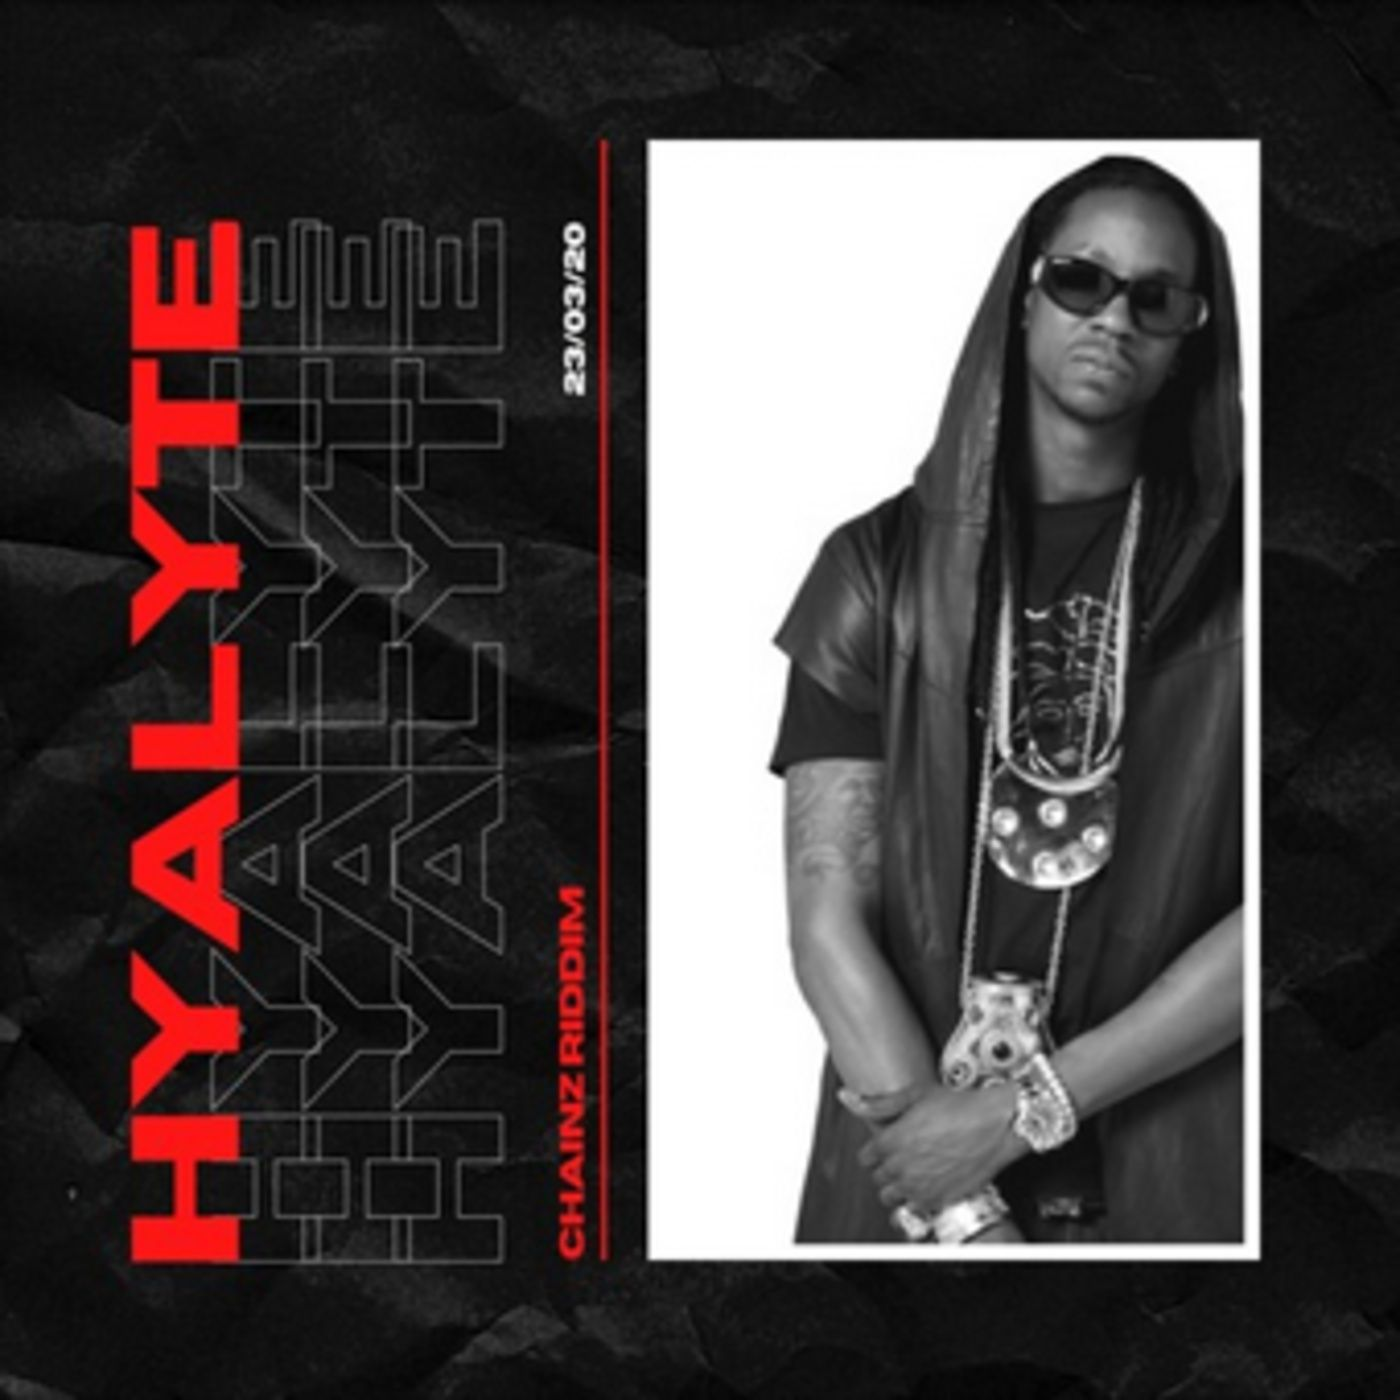 2 Chainz - Watch Out (HYALYTE Riddim)